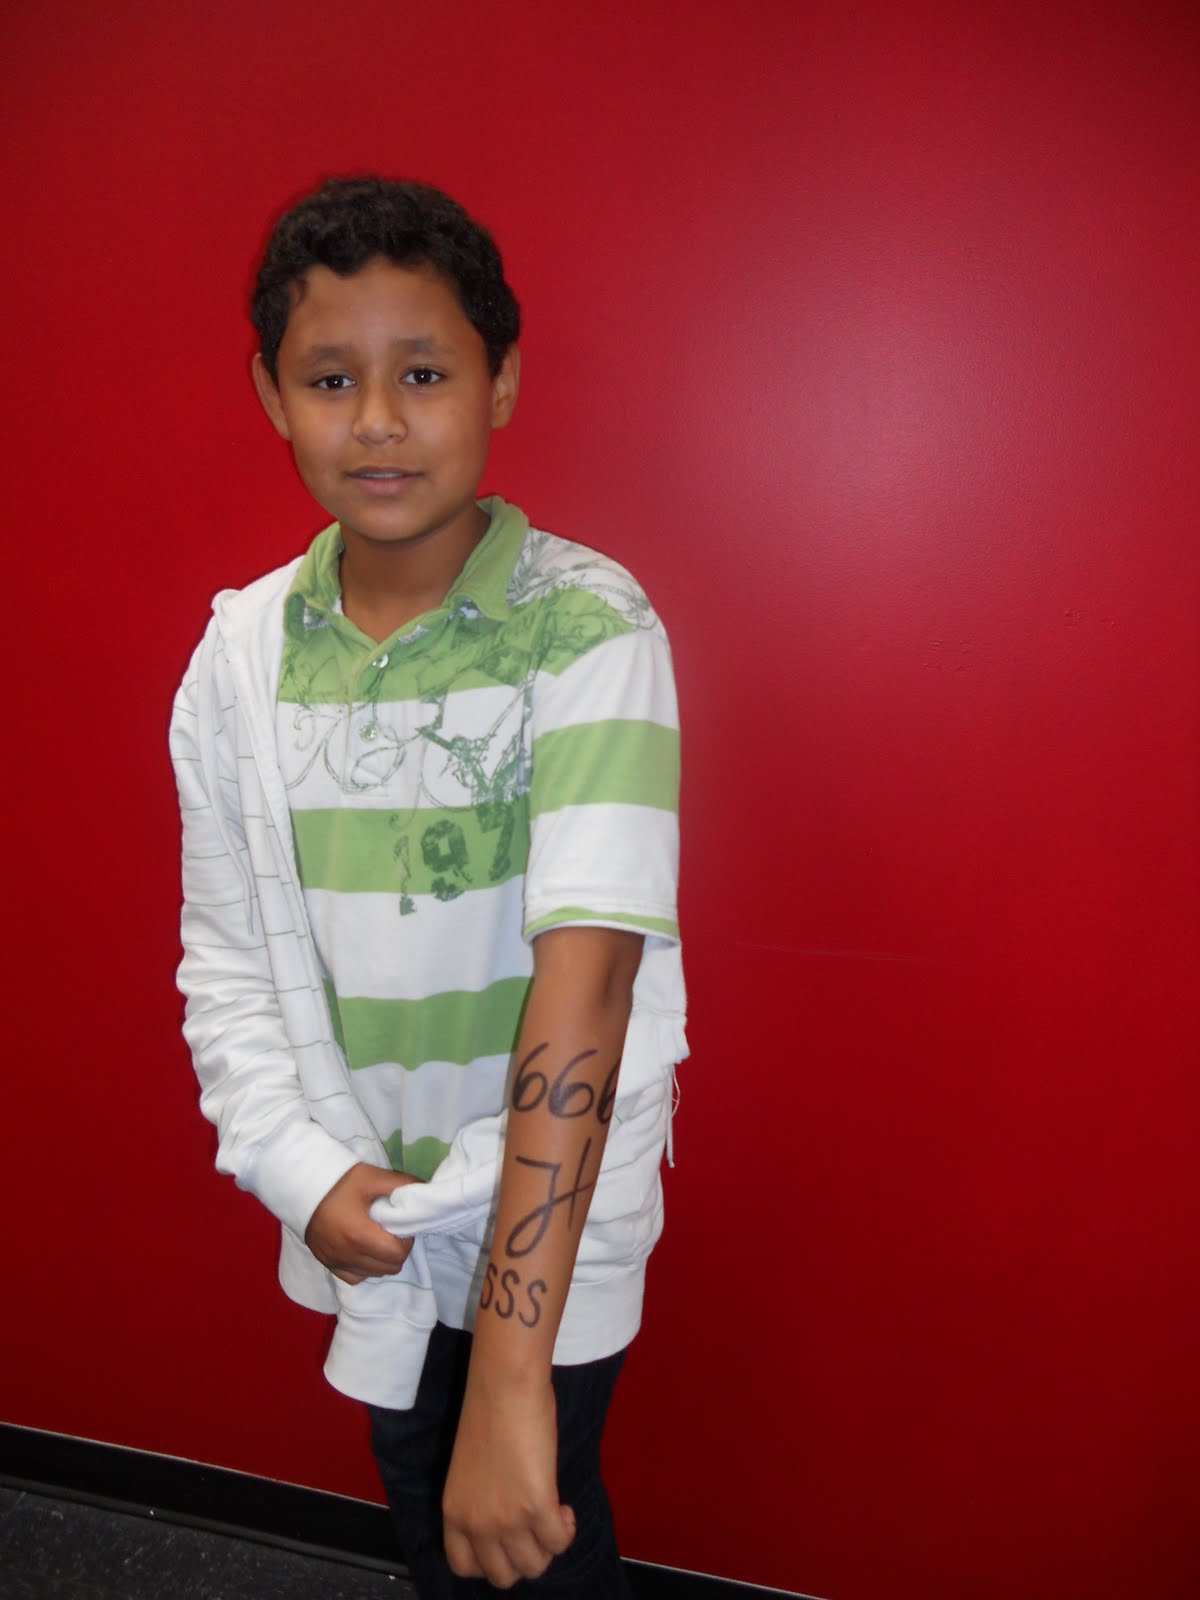 http://3.bp.blogspot.com/_TSnTRFqfaxA/THPvgyt2tRI/AAAAAAAAD7o/wv9--hhLWWg/s1600/IV+Jornada+de+Tattoos+084.jpg